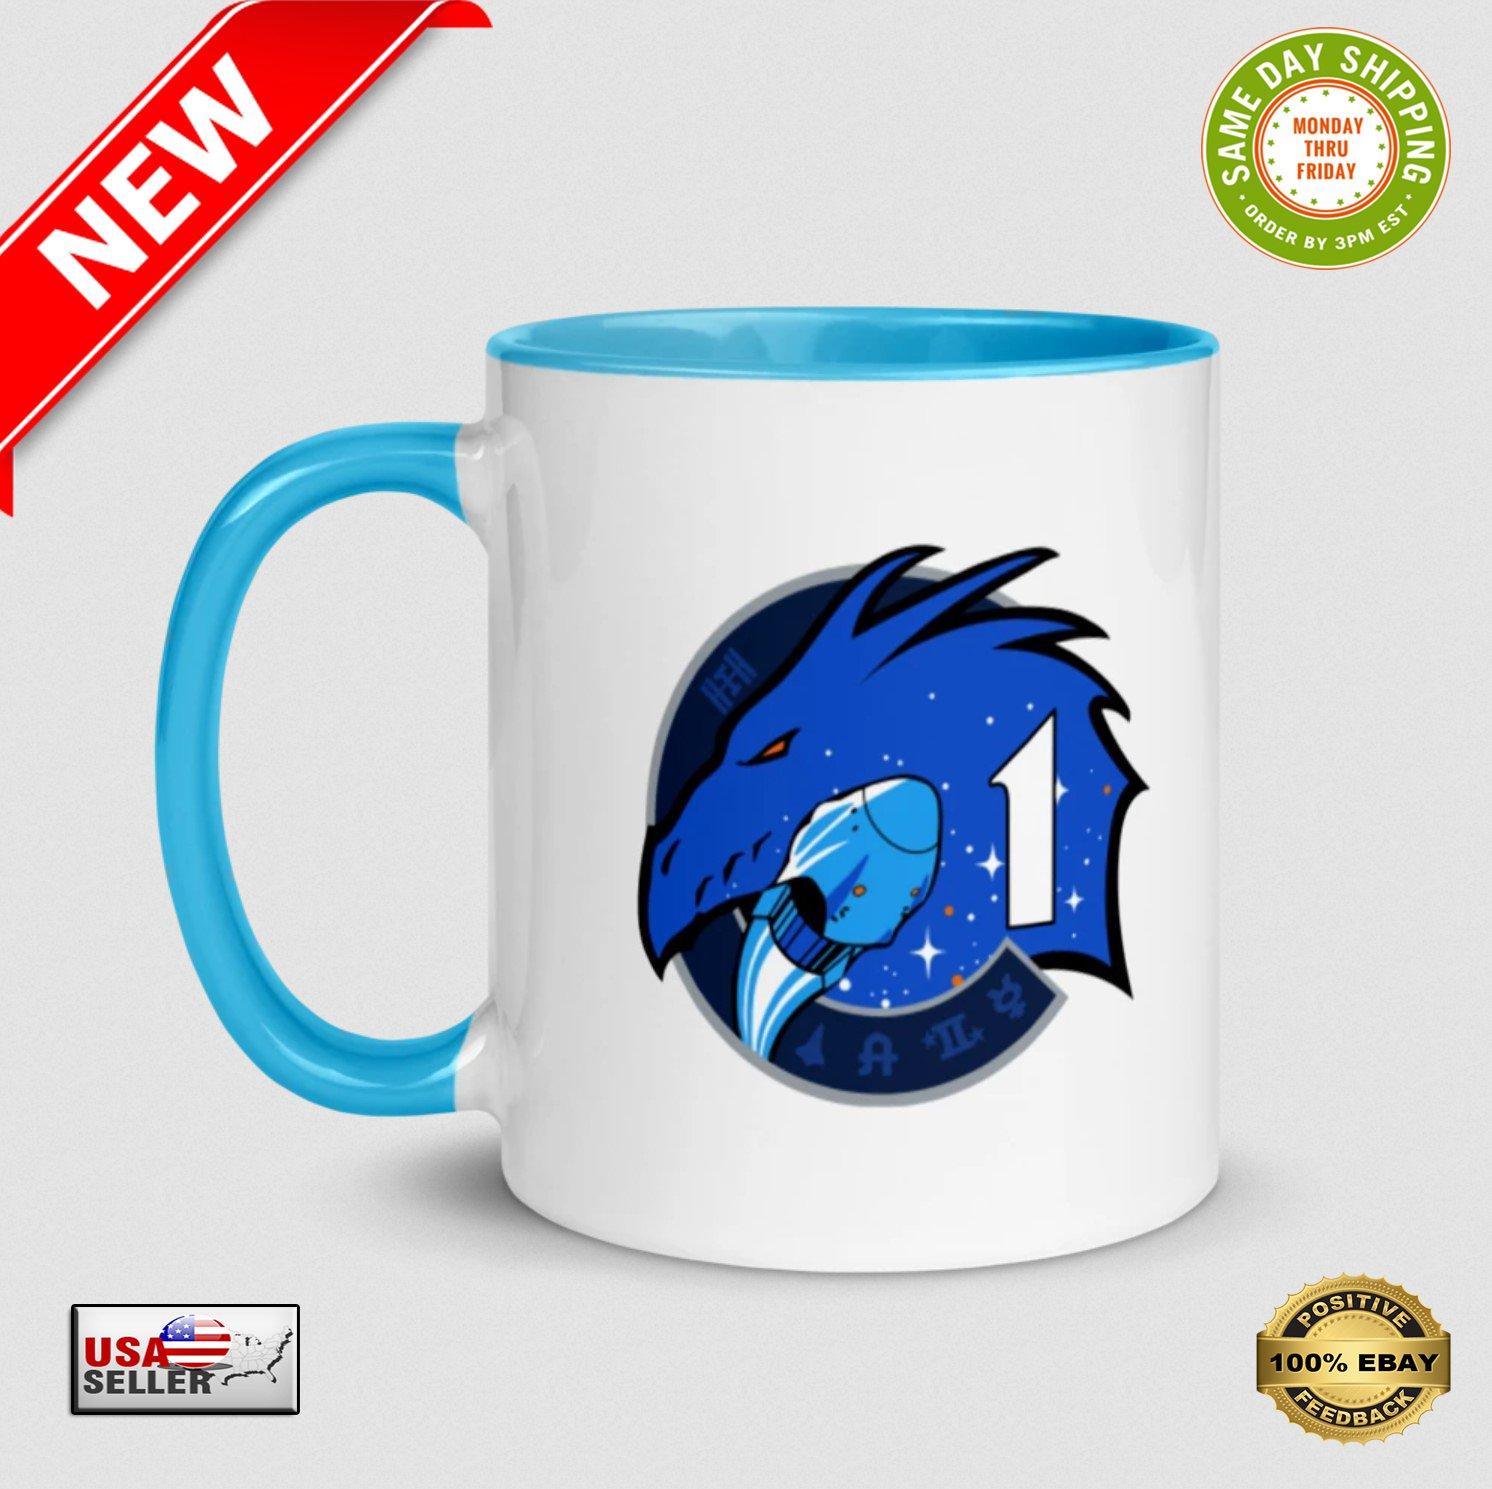 � NASA Crew 1 Dragon Spacecraft Ceramic Coffee / Tea Drinking Mug - NEW �